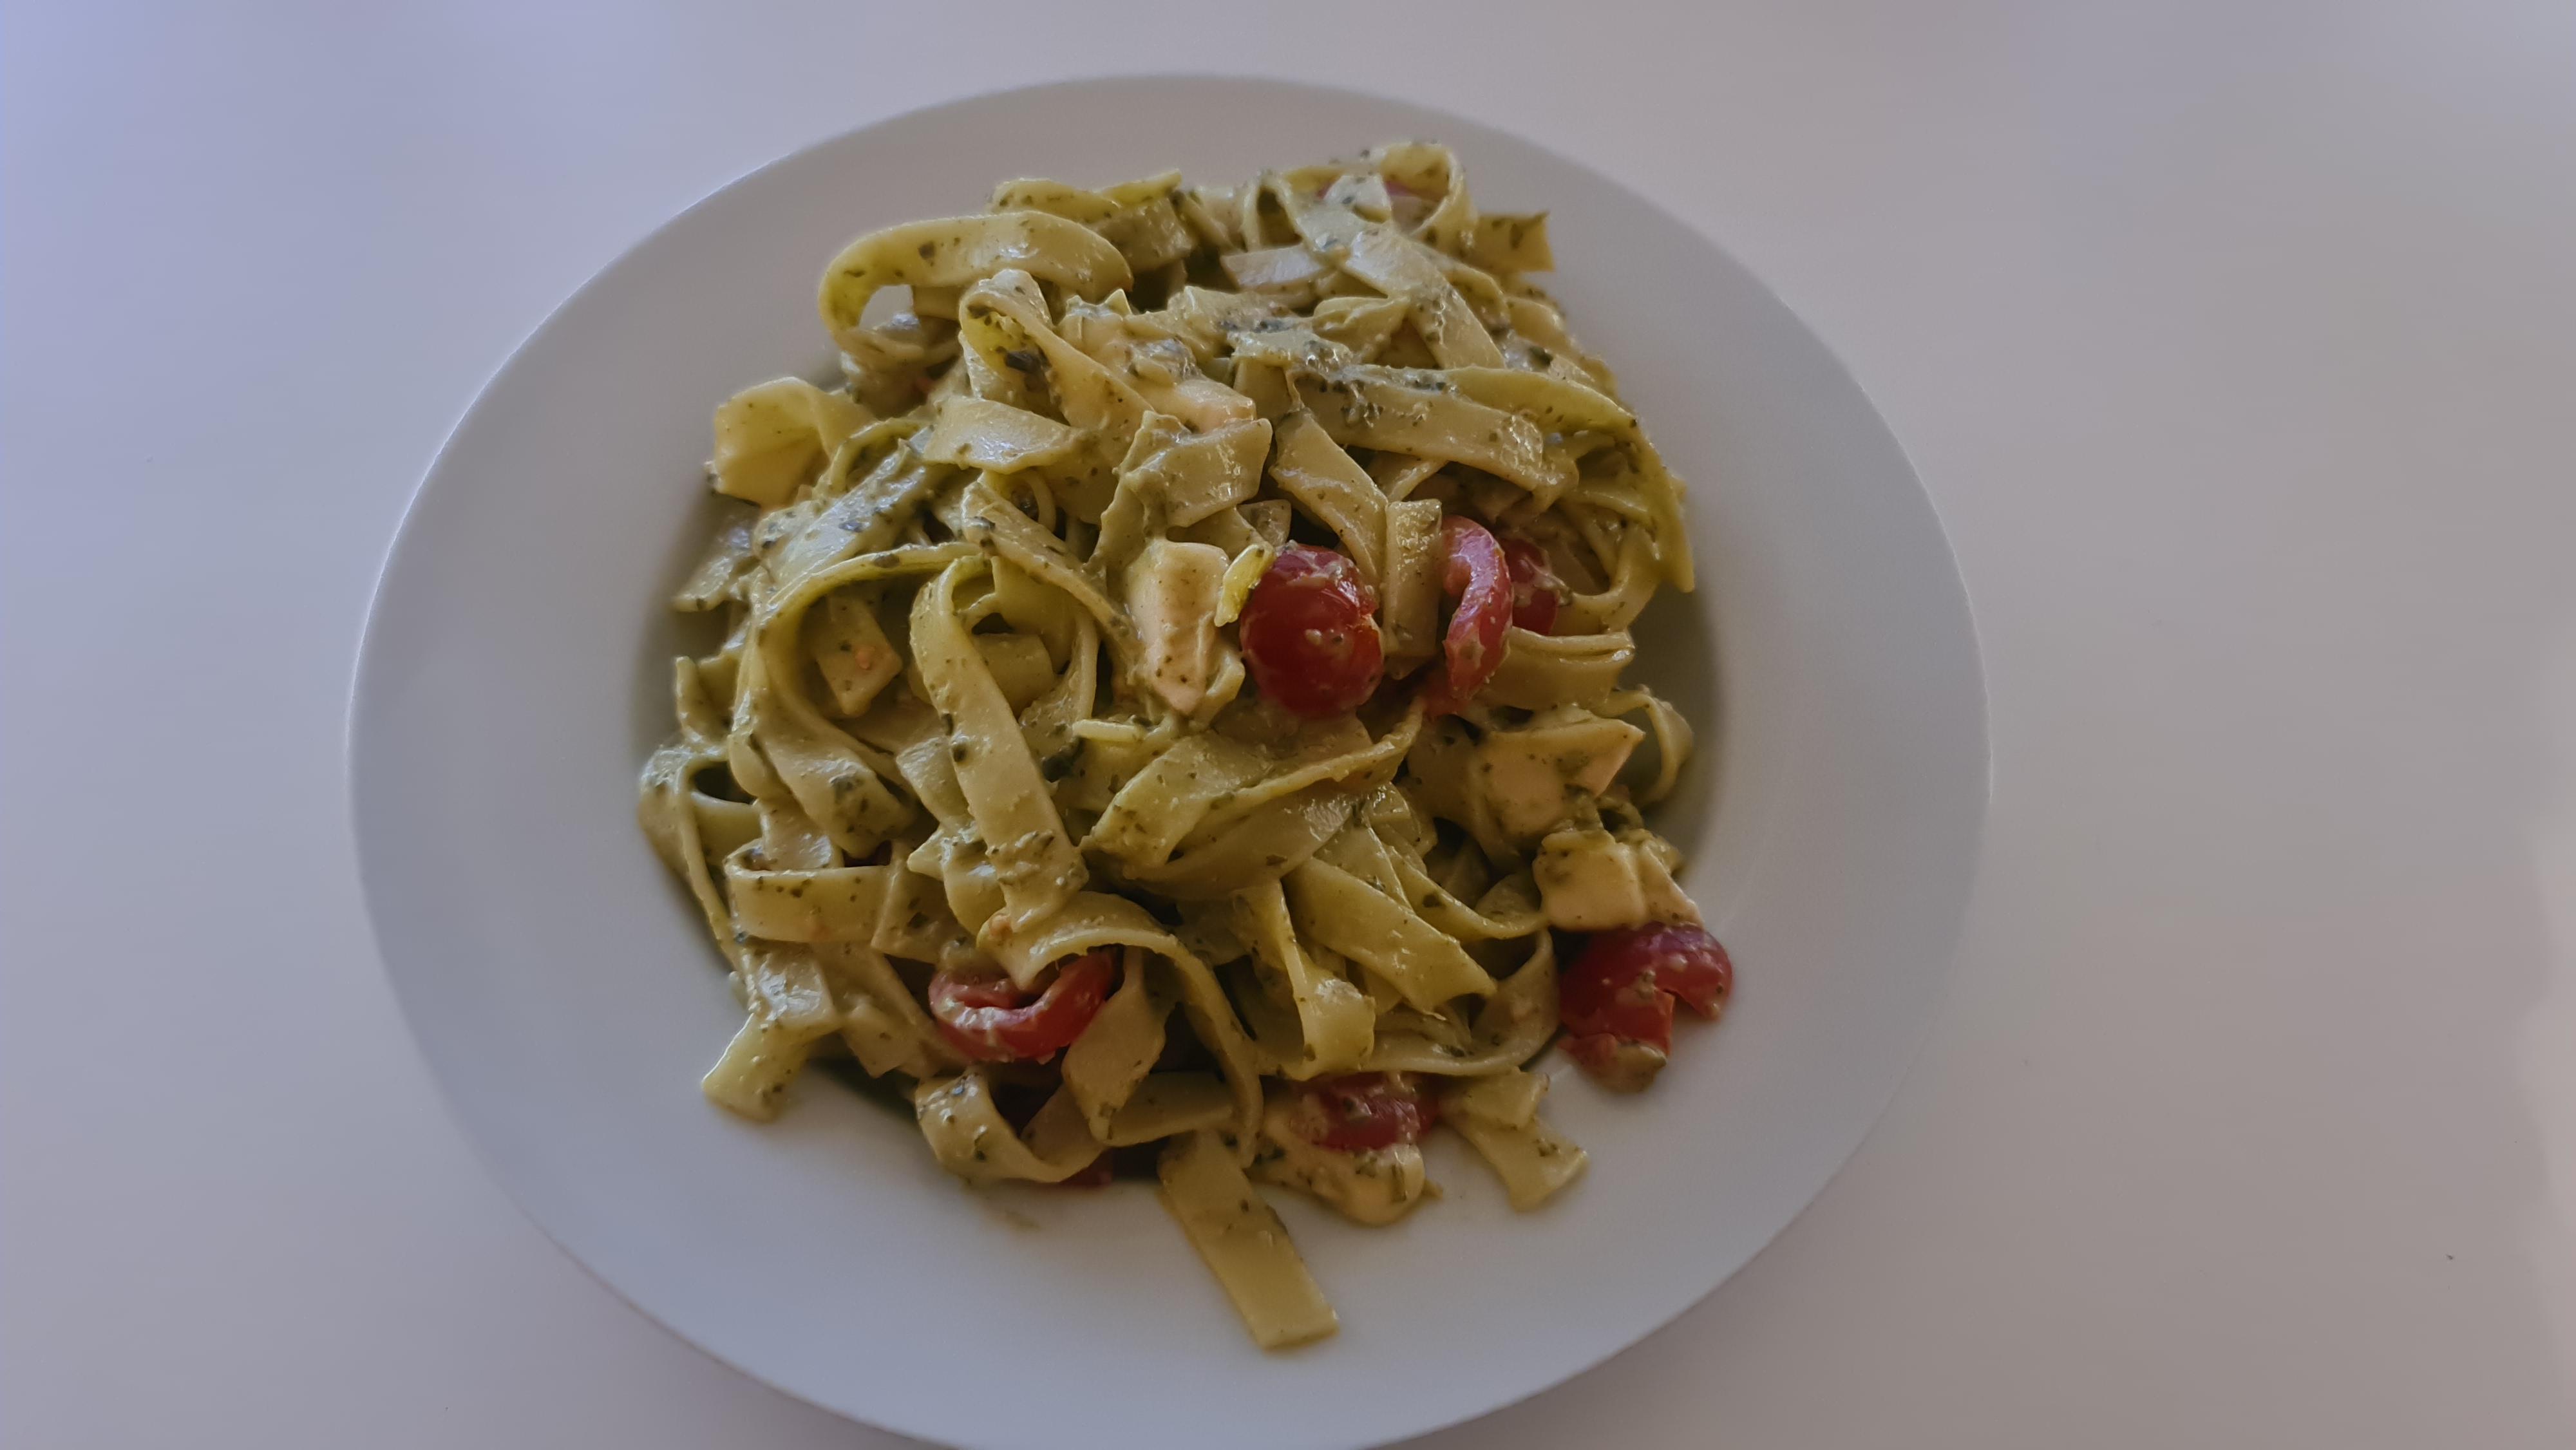 https://foodloader.net/Holz_2020-06-27_Tagliatelle_Basilico_e_Pomodori.jpg